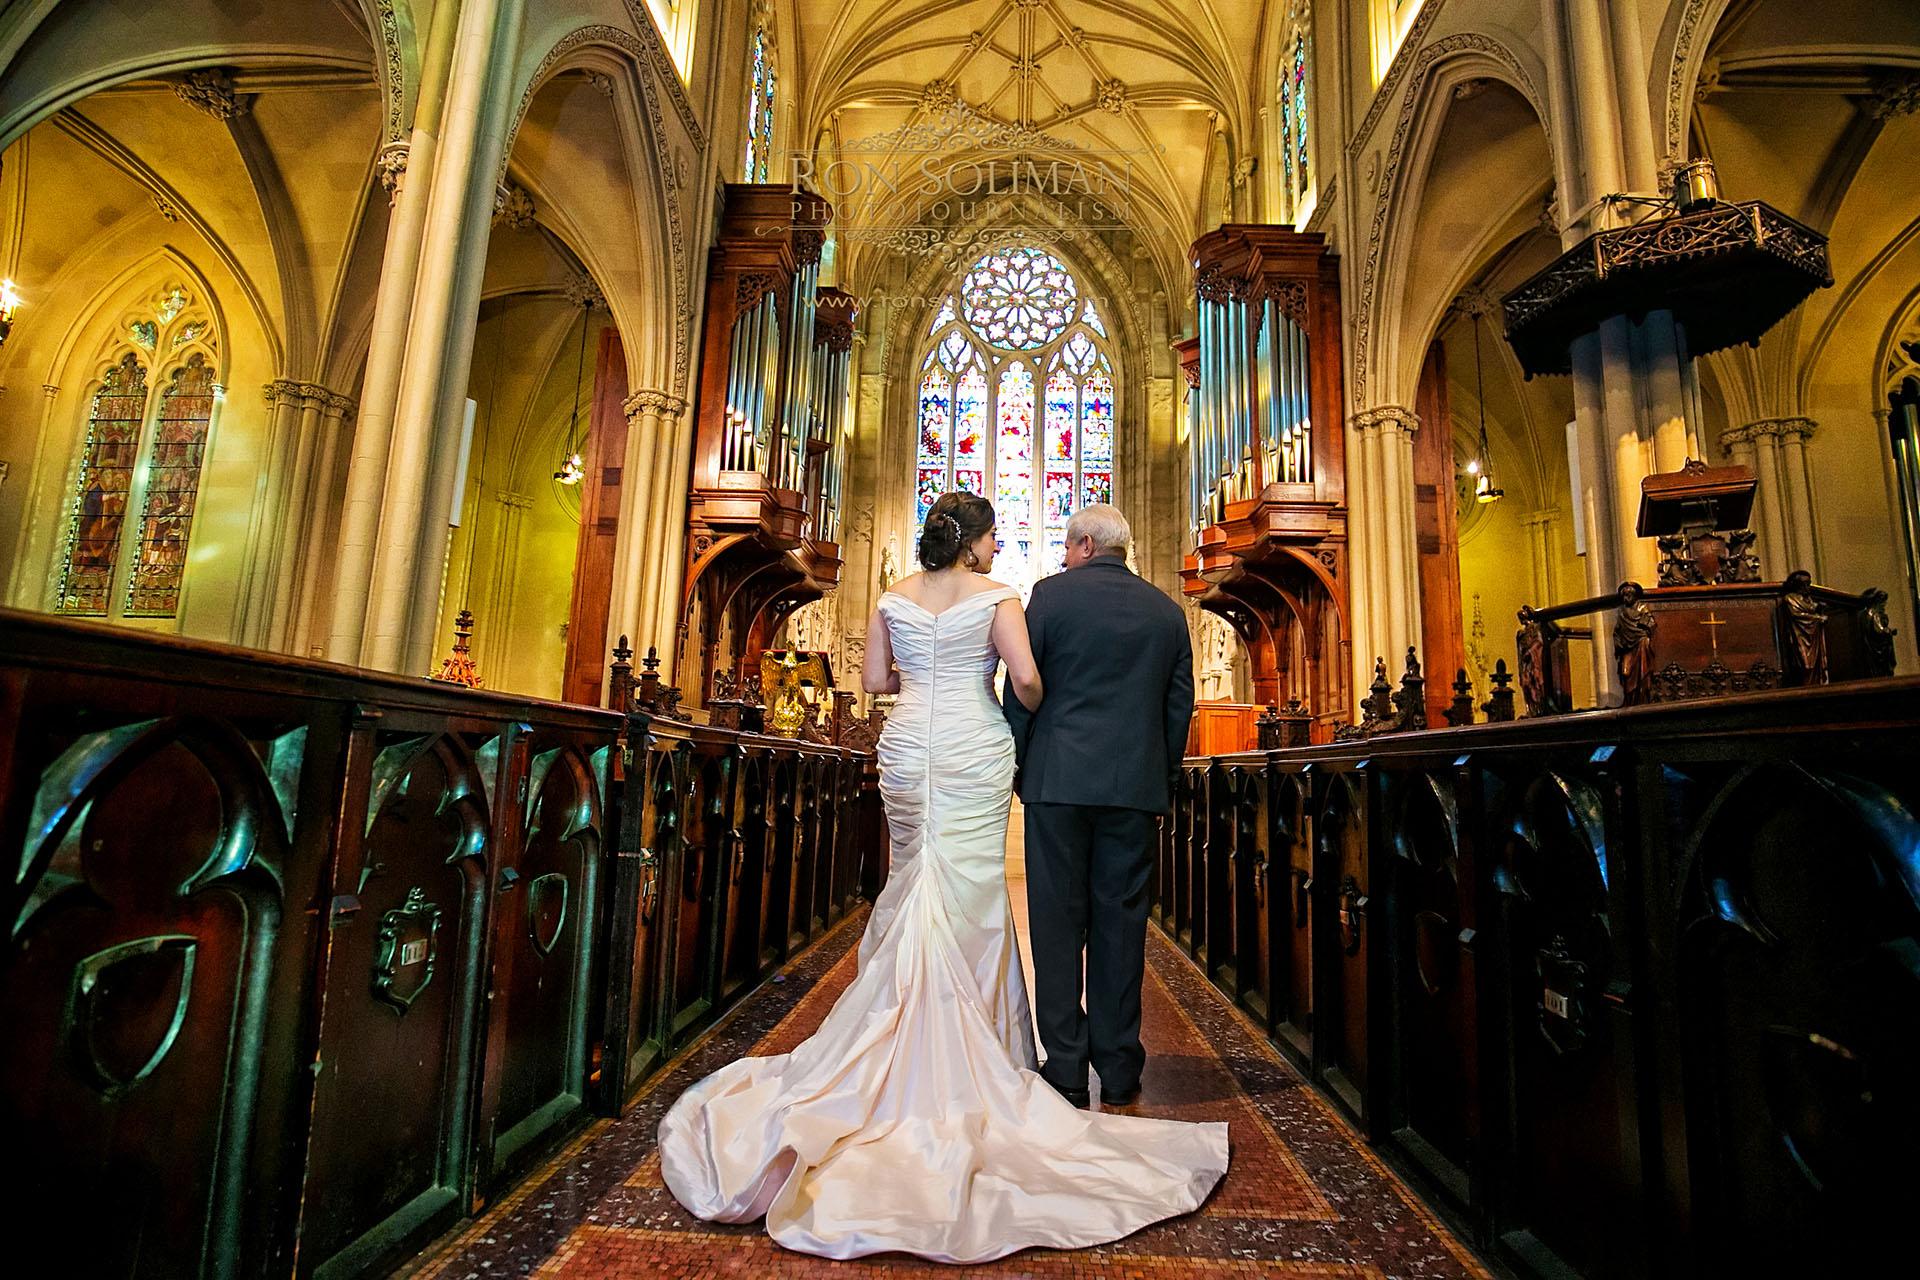 LIGHTHOUSE CHELSEA PIERS WEDDING 12